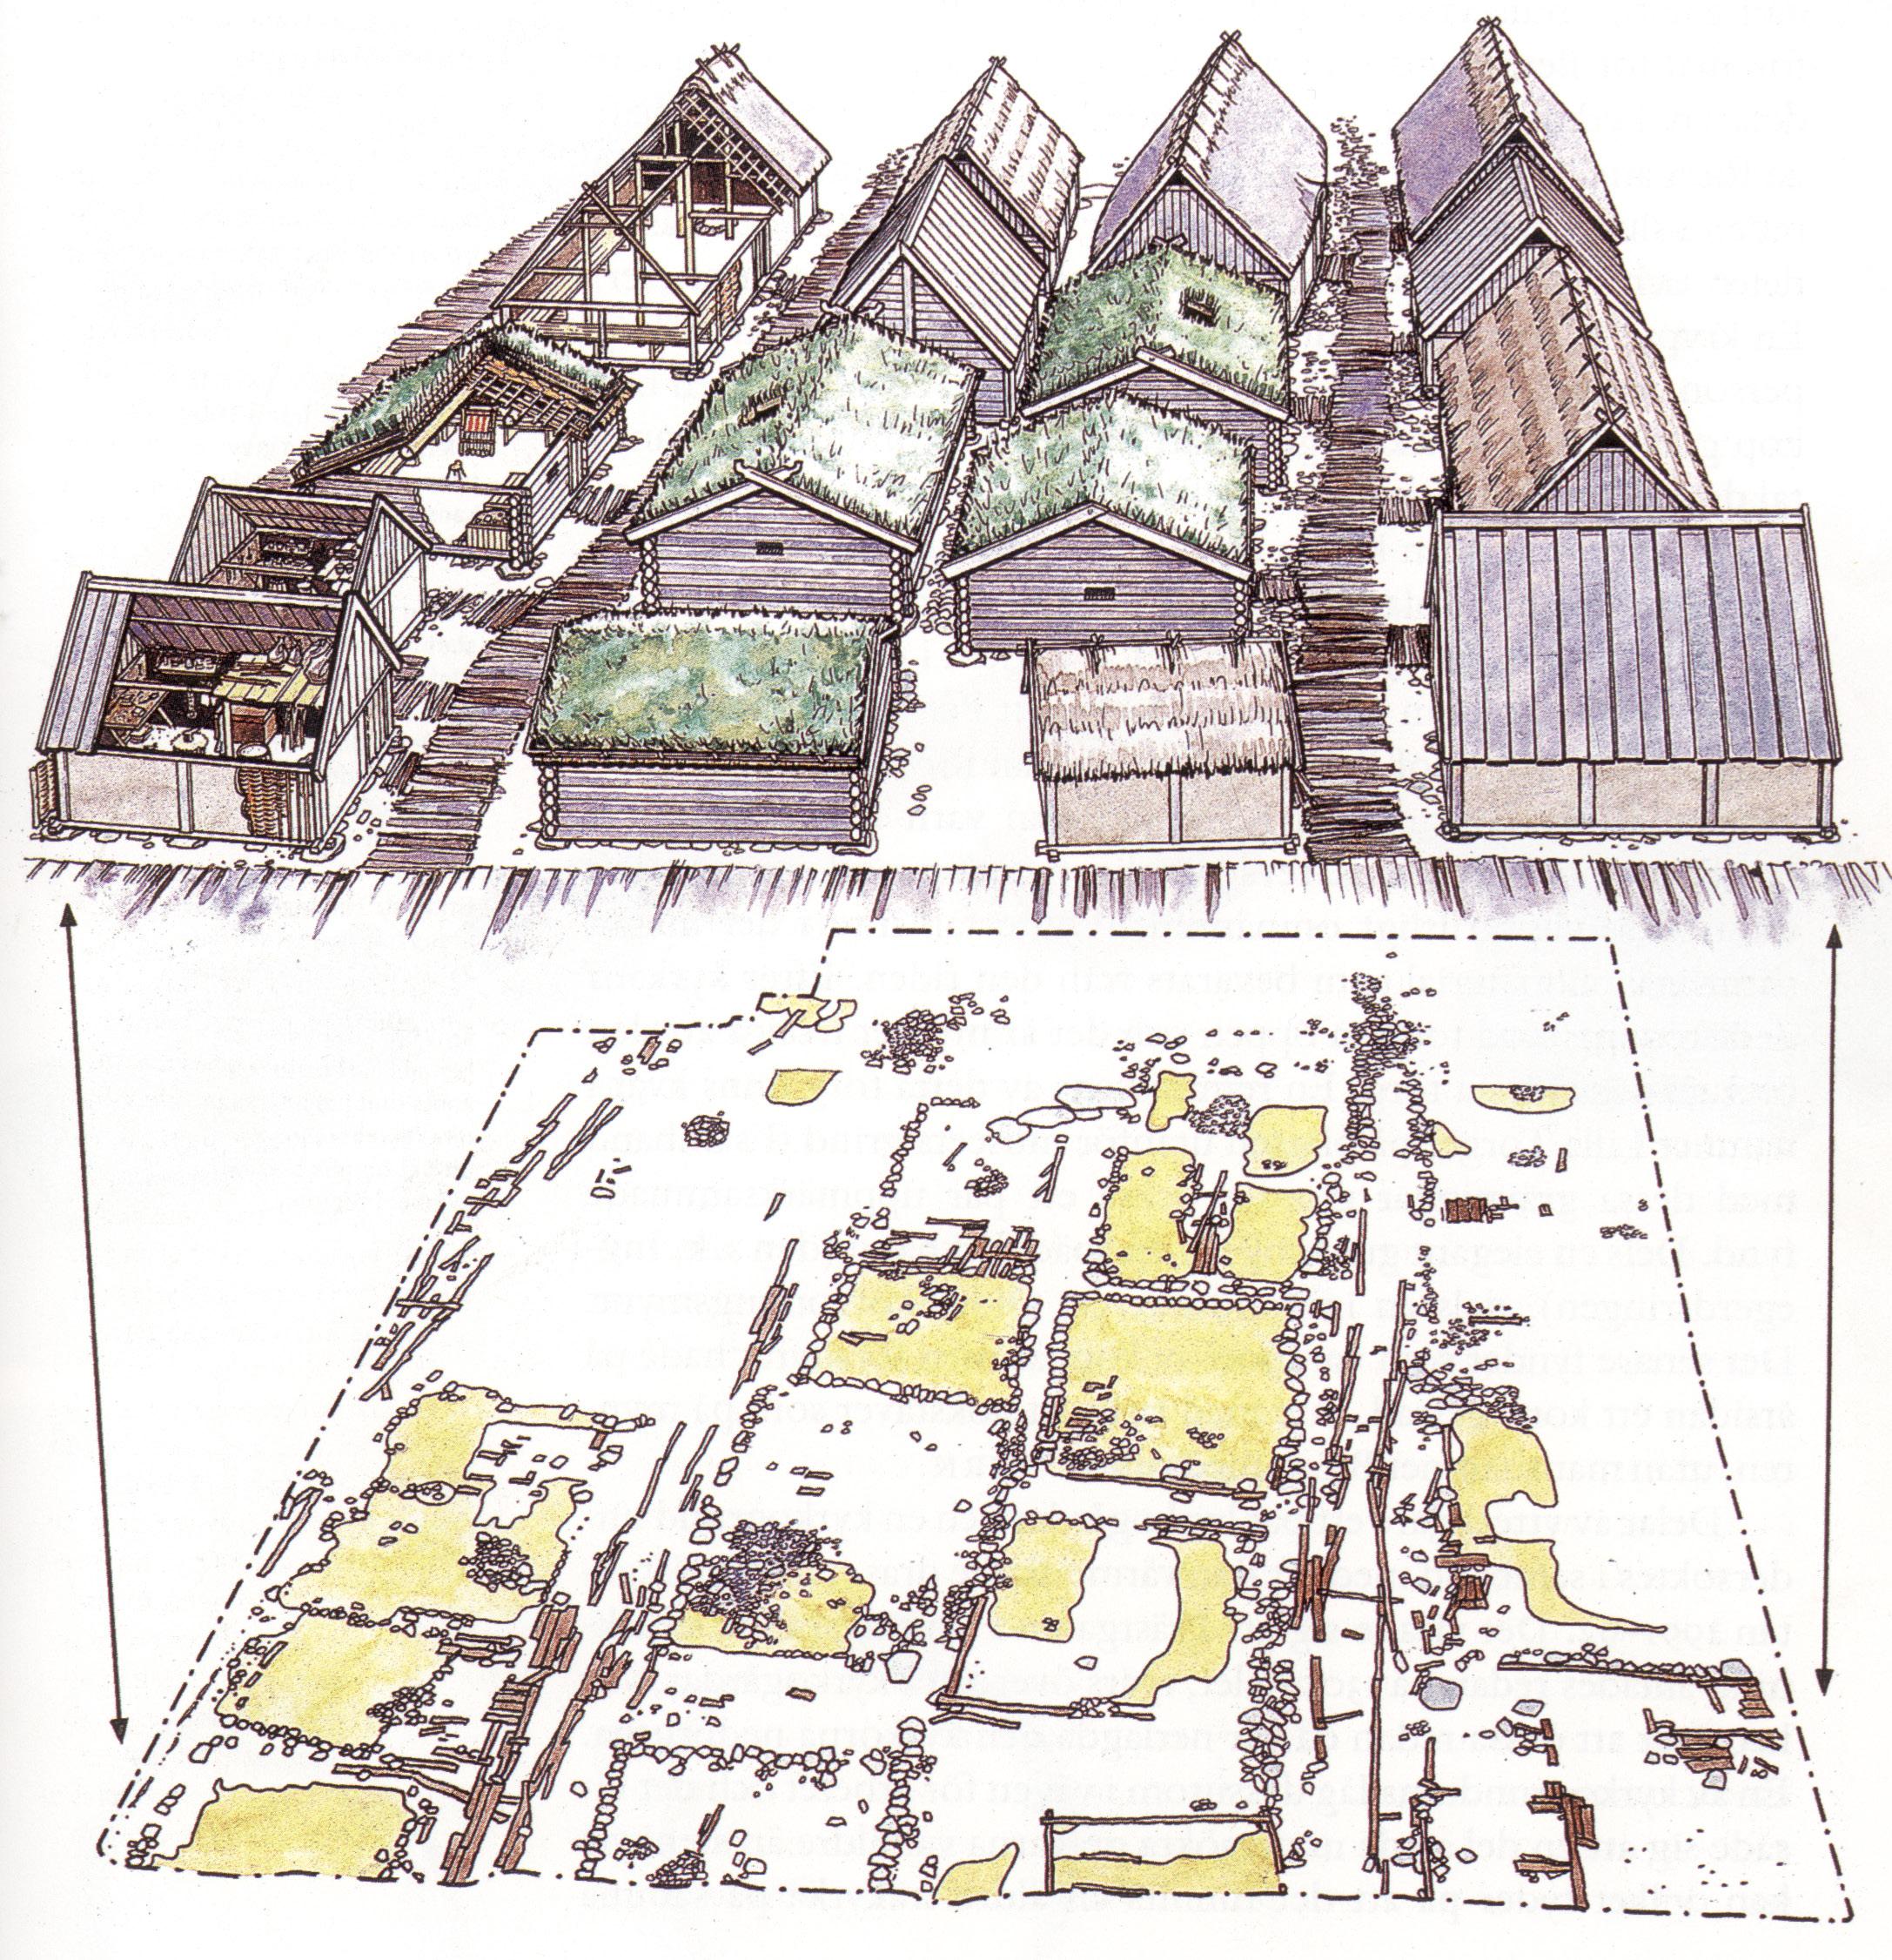 sigtuna reconstruction